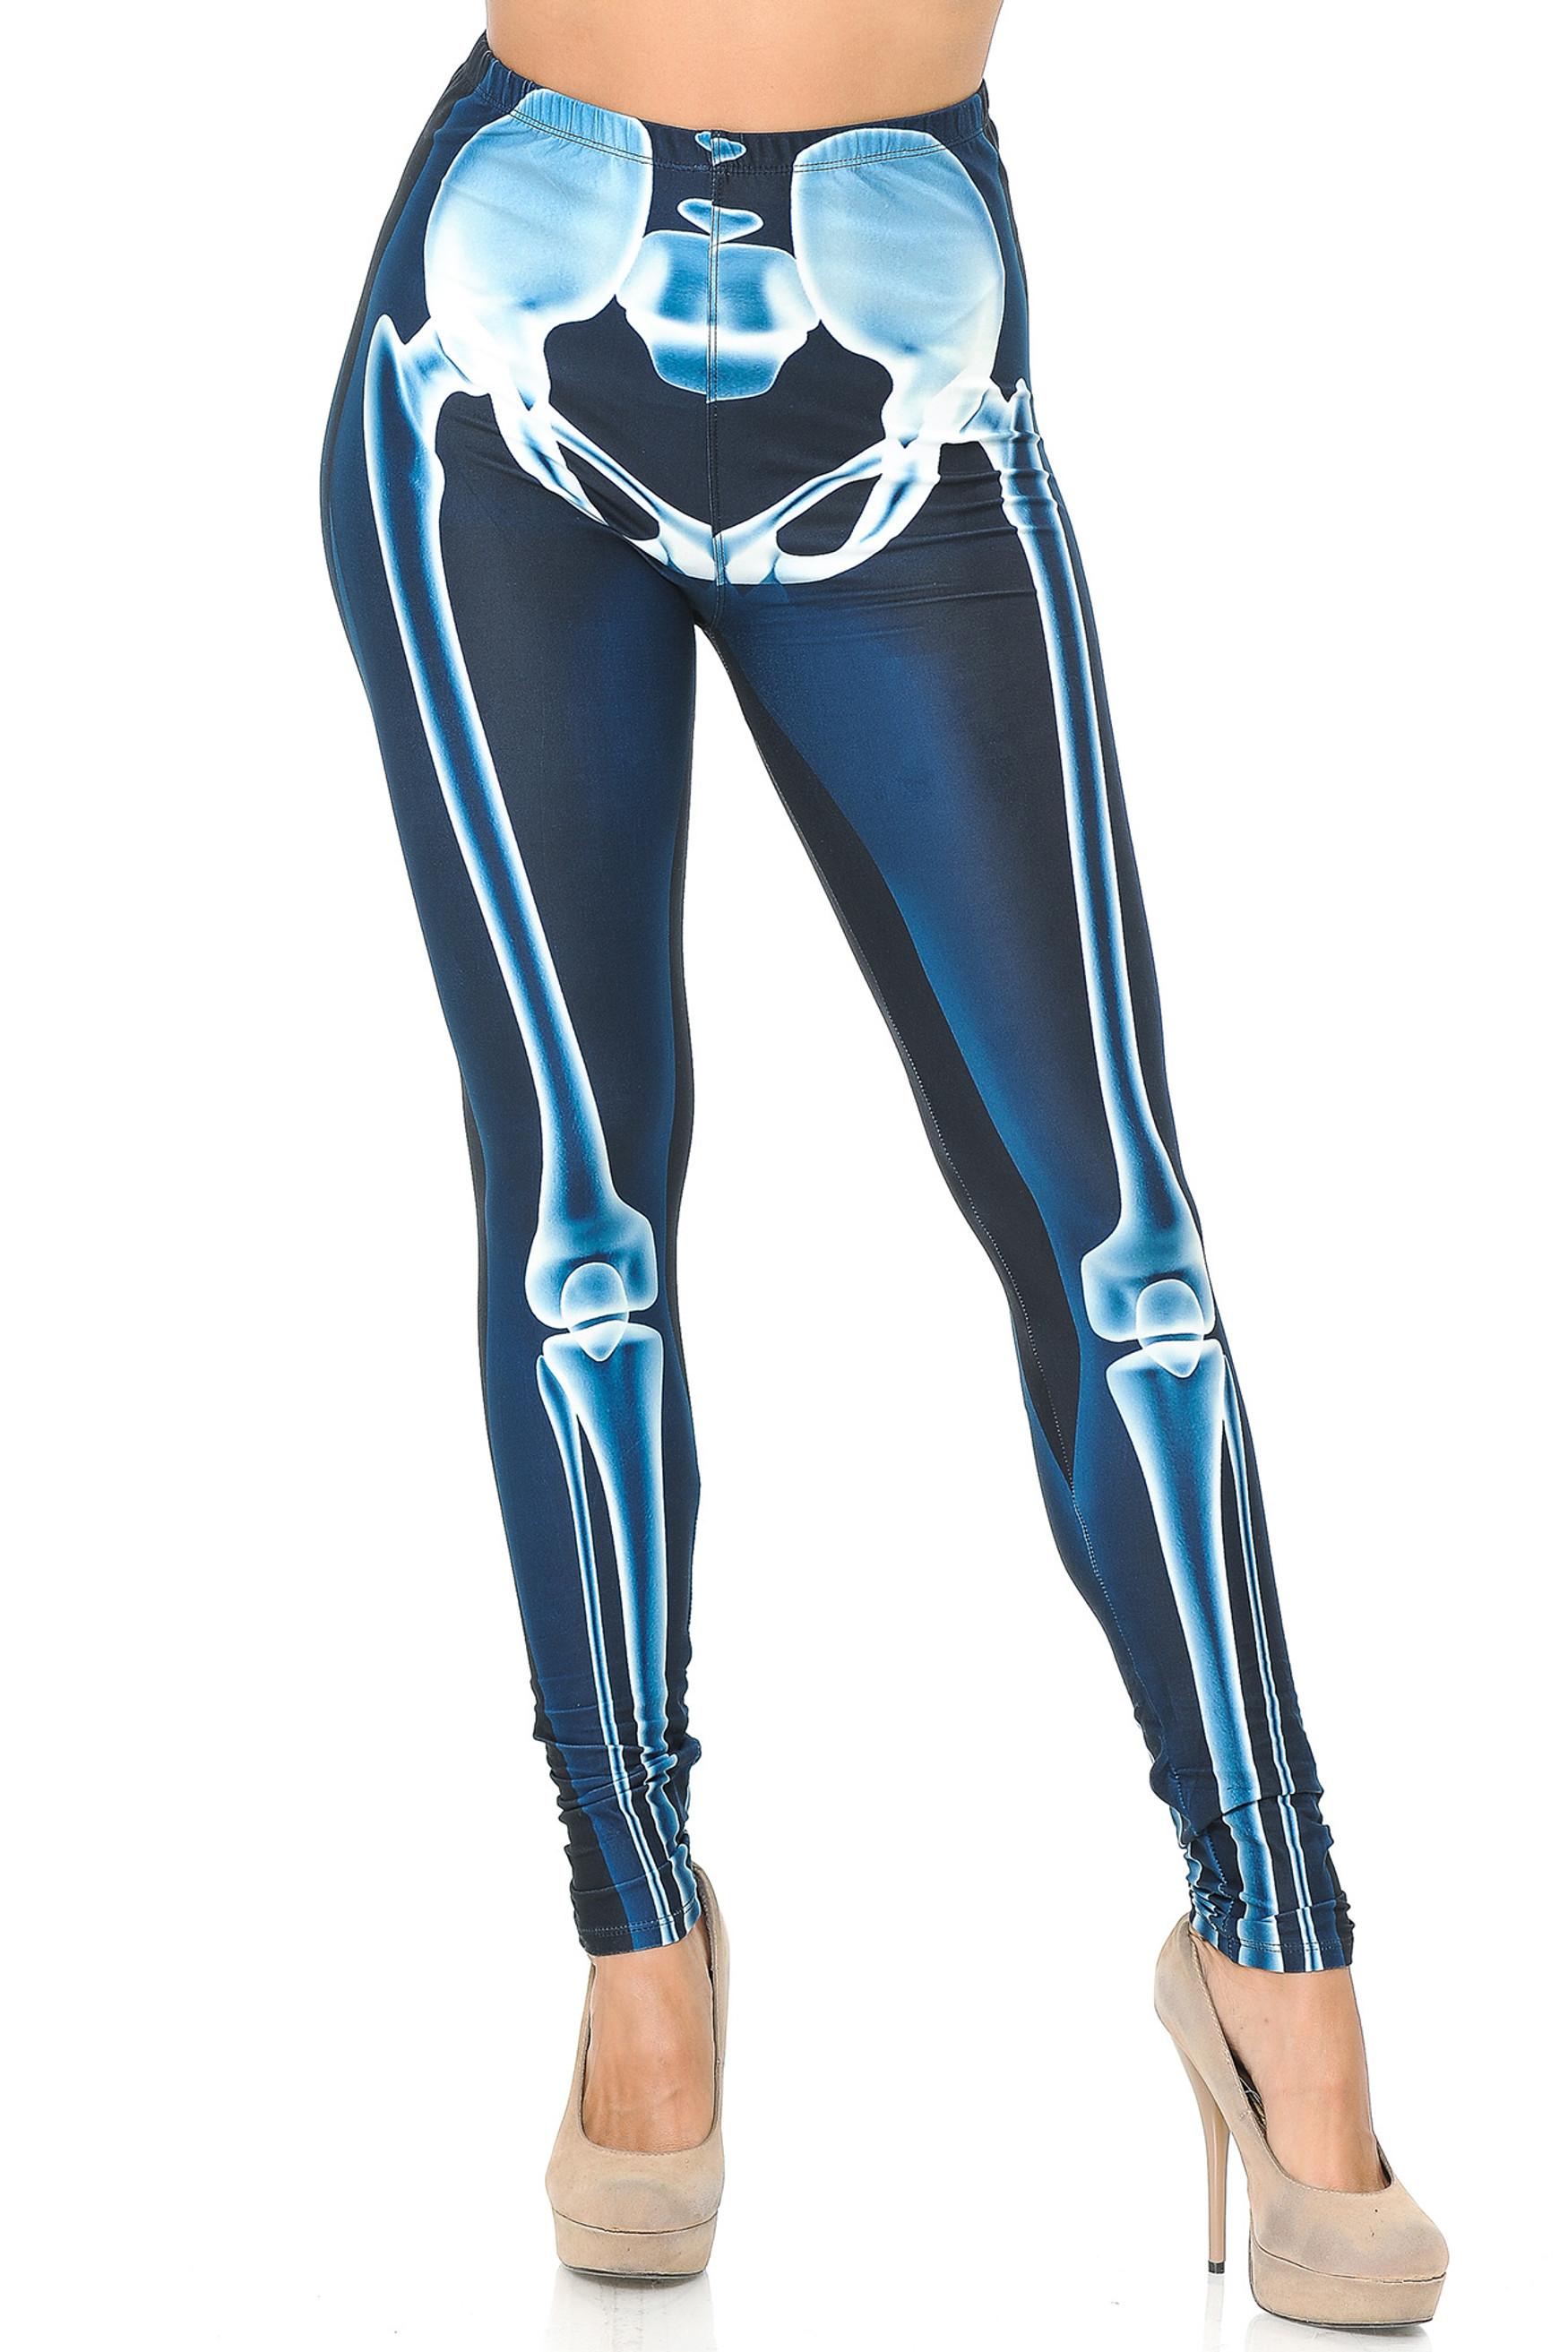 Creamy Soft Radioactive Skeleton Bones Plus Size Leggings - USA Fashion™